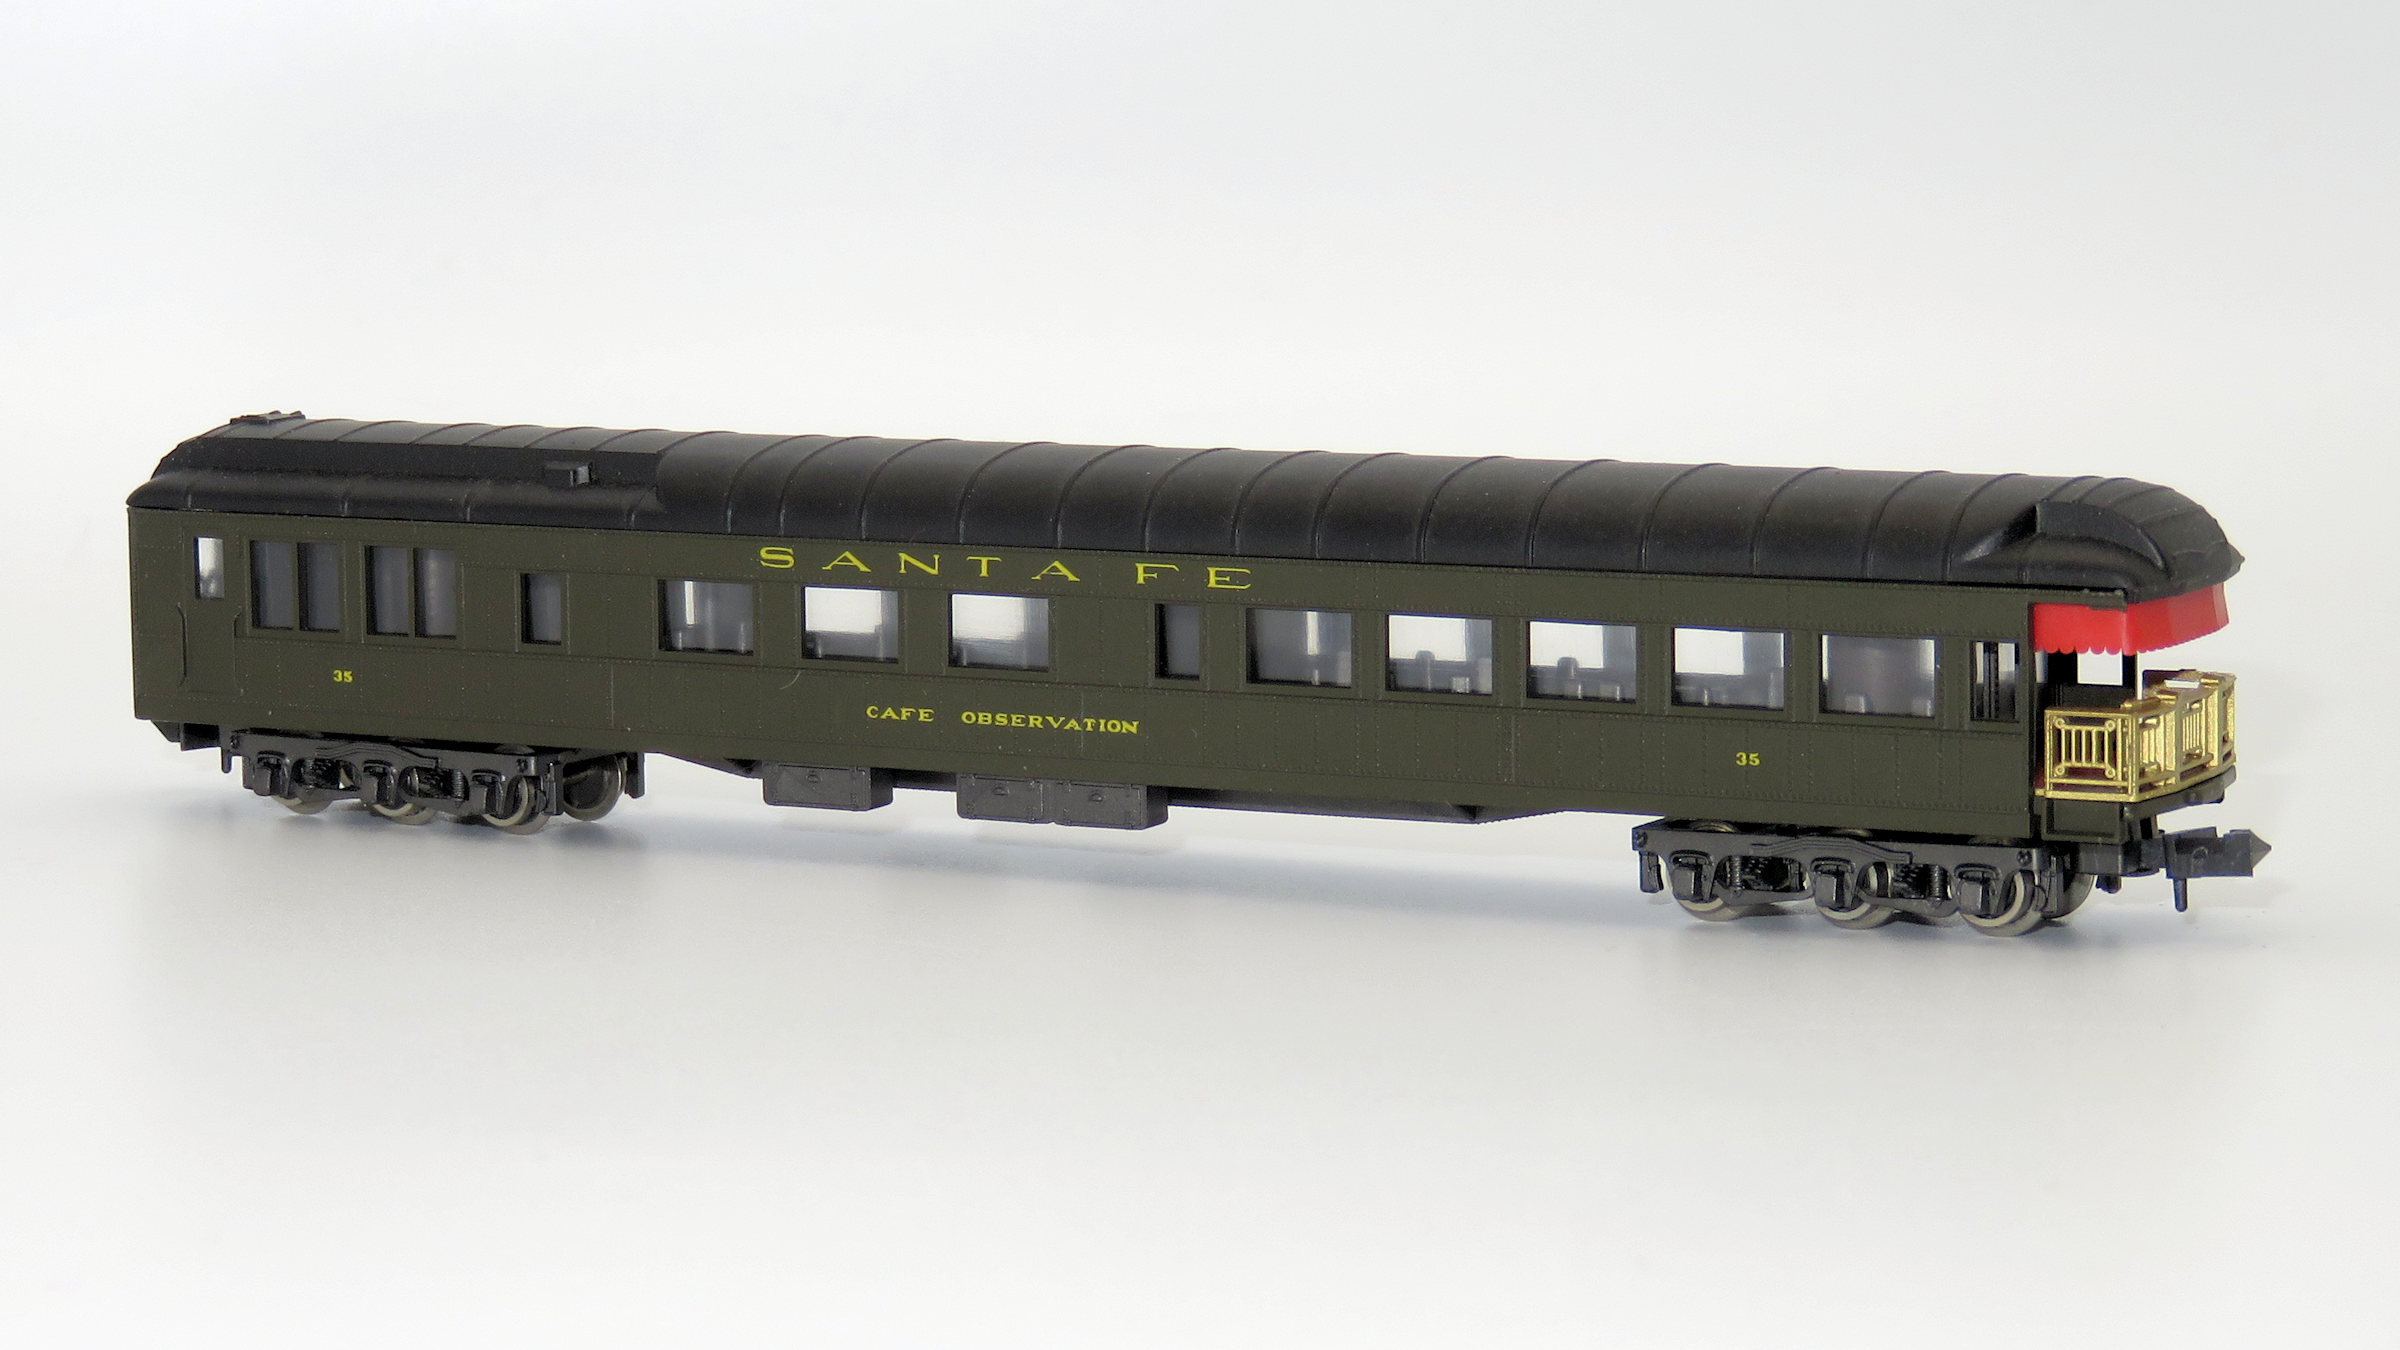 N Scale - Rivarossi - 9541 - Passenger Car, Heavyweight, Pullman, Observation - Santa Fe - 35